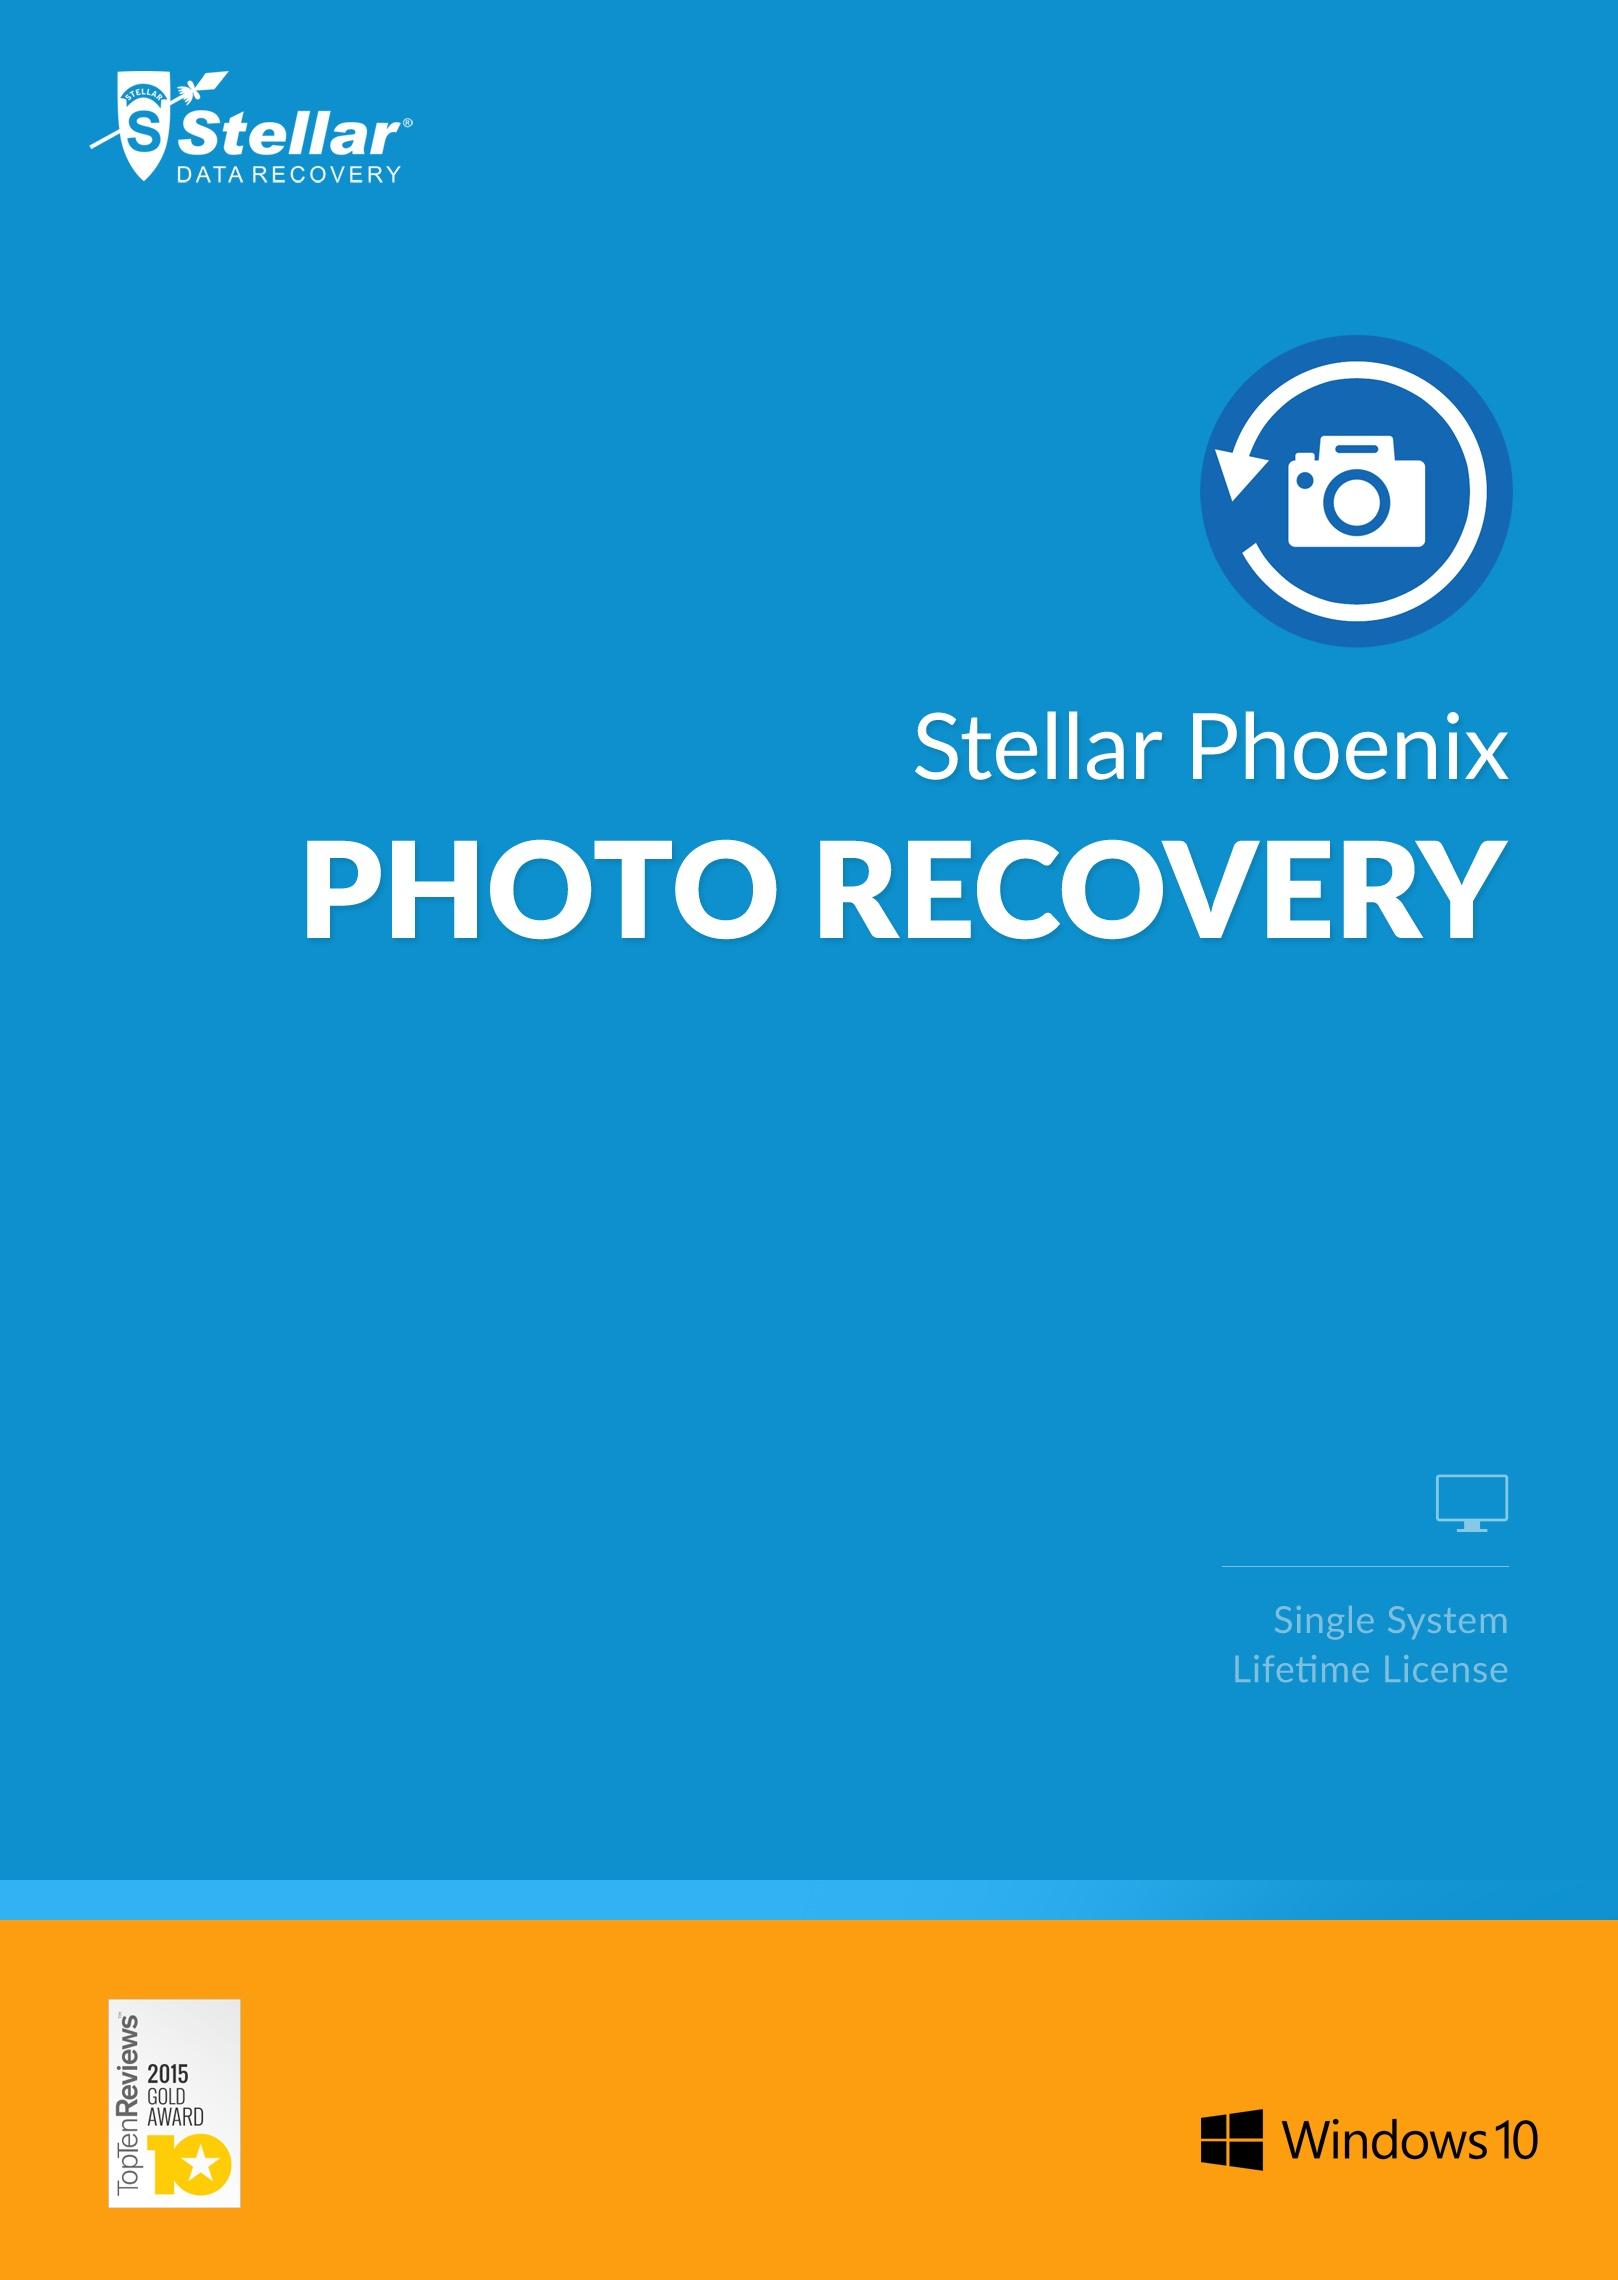 stellar-phoenix-photo-recovery-windows-download